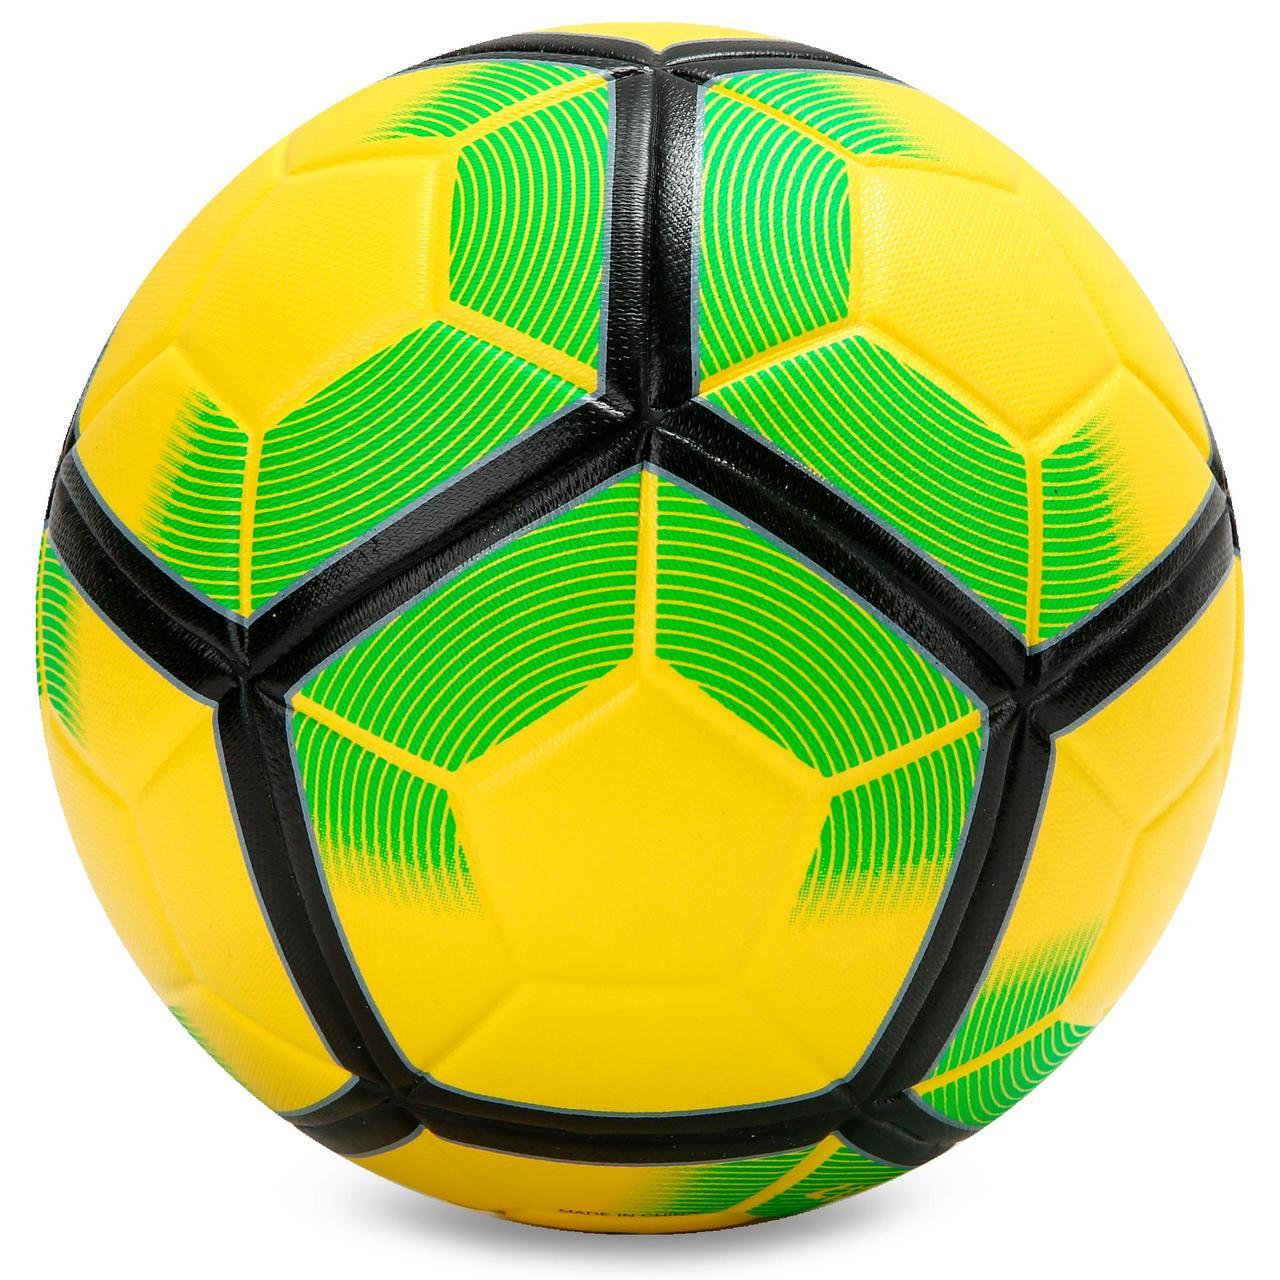 М'яч футбольний №5 PU PREMIER LEAGUE FB-5927, Жовто-салатовий